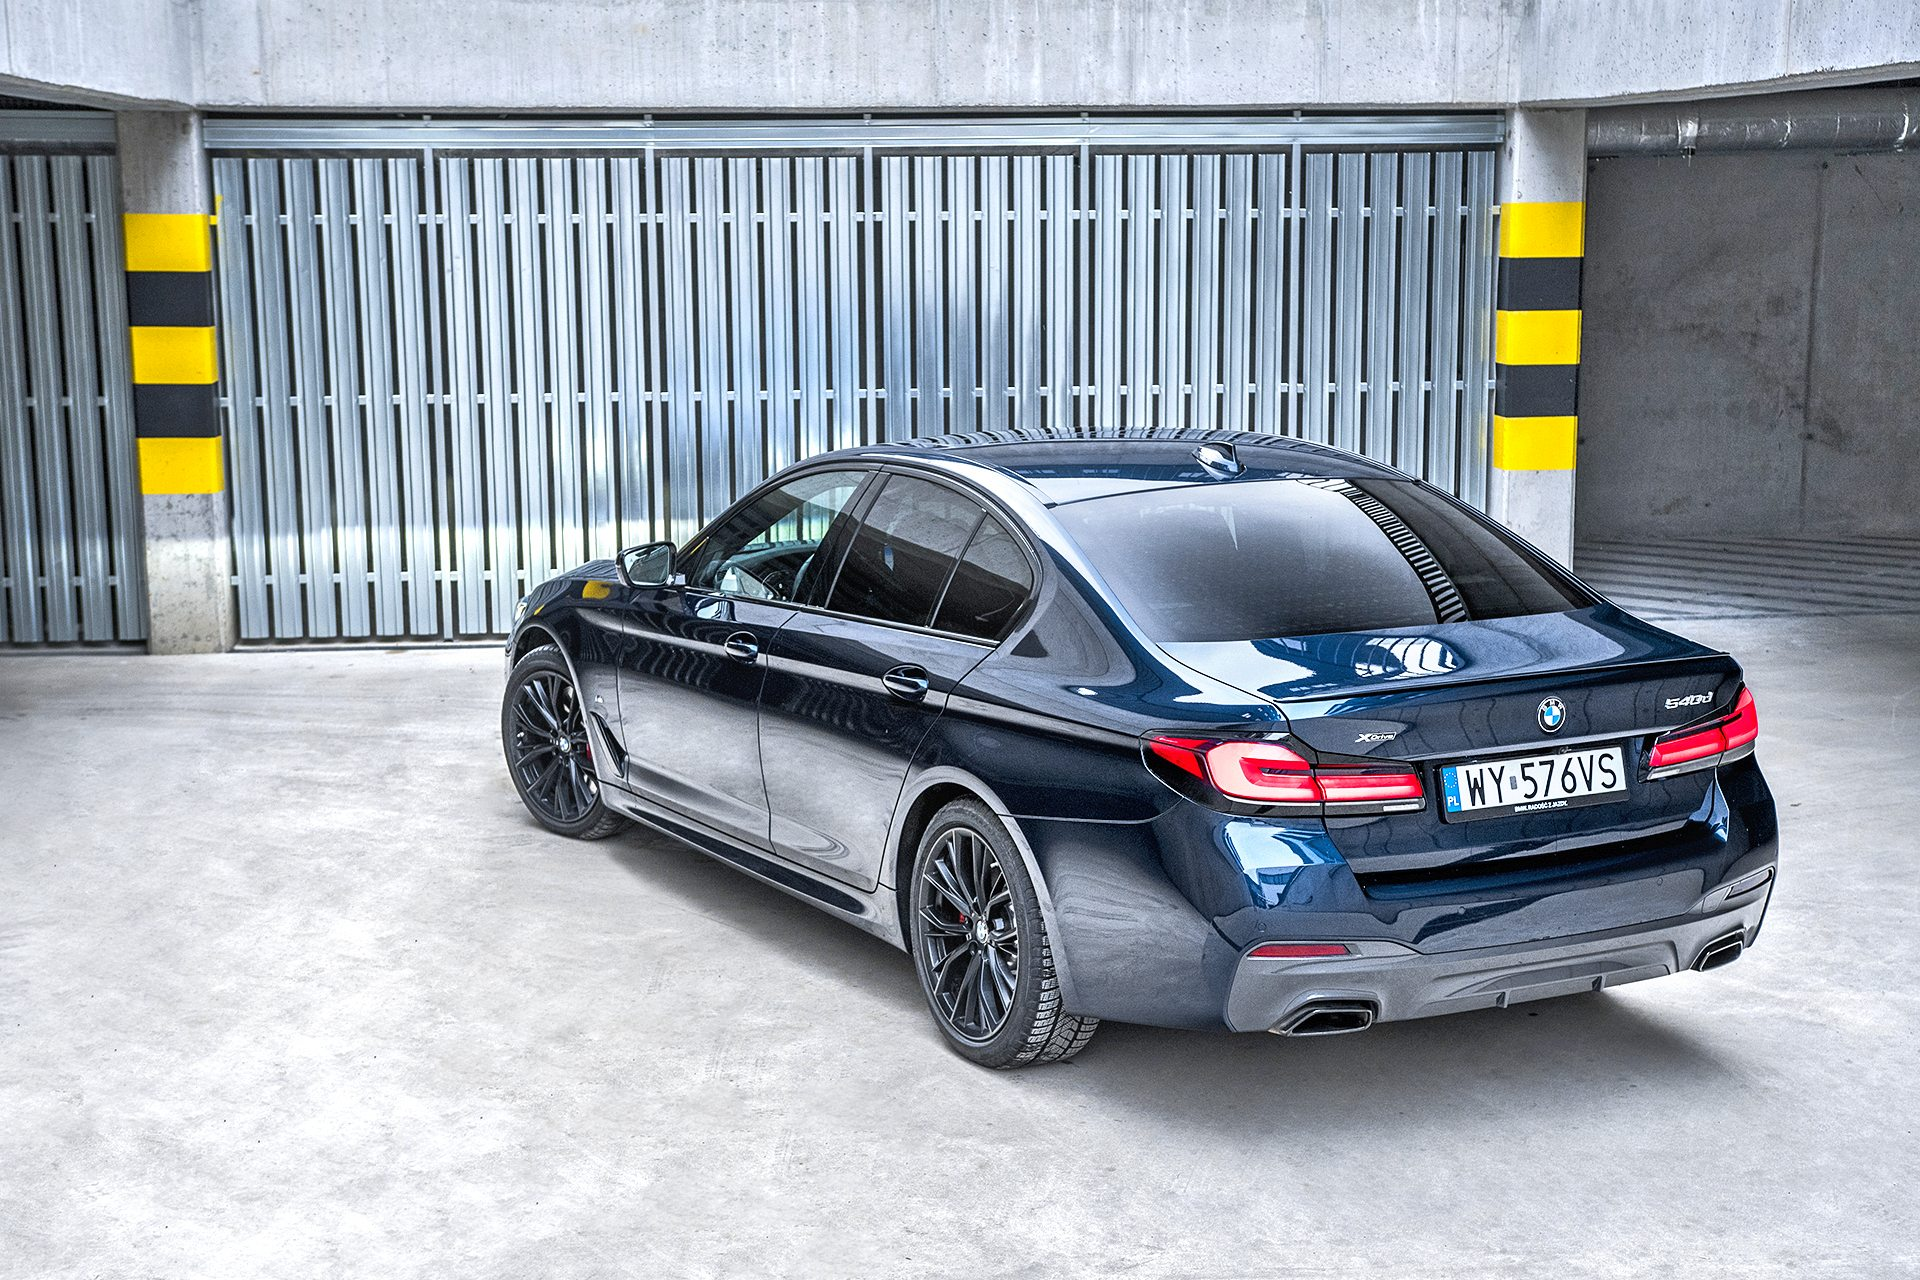 KSZ_BMW_540d_G30_LCI_STATYKA_008